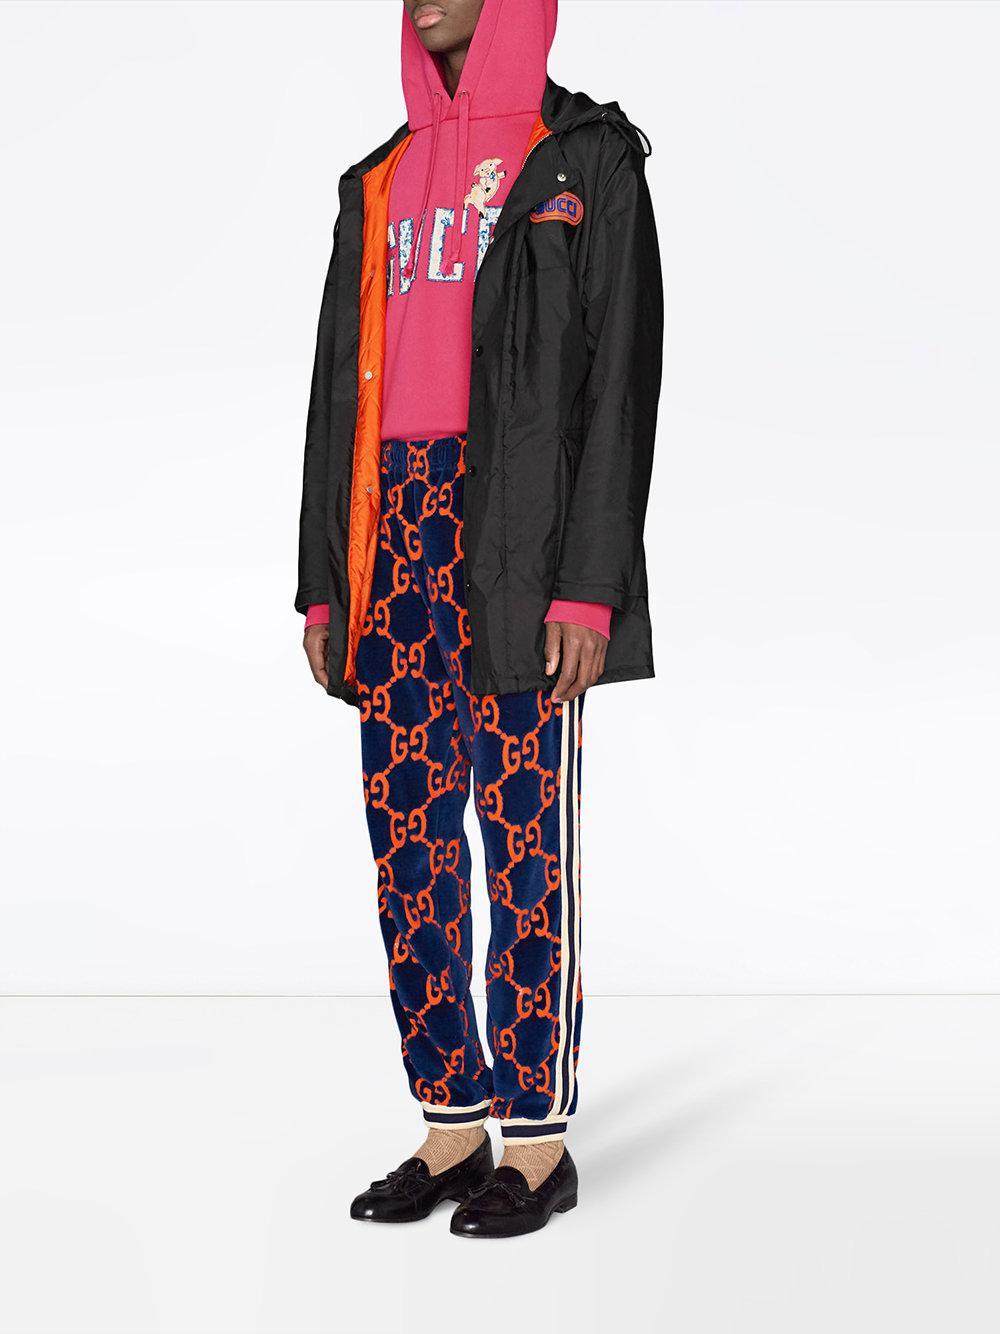 cd90e785b7e Lyst - Gucci Nylon Jacket With Sega Patch in Black for Men